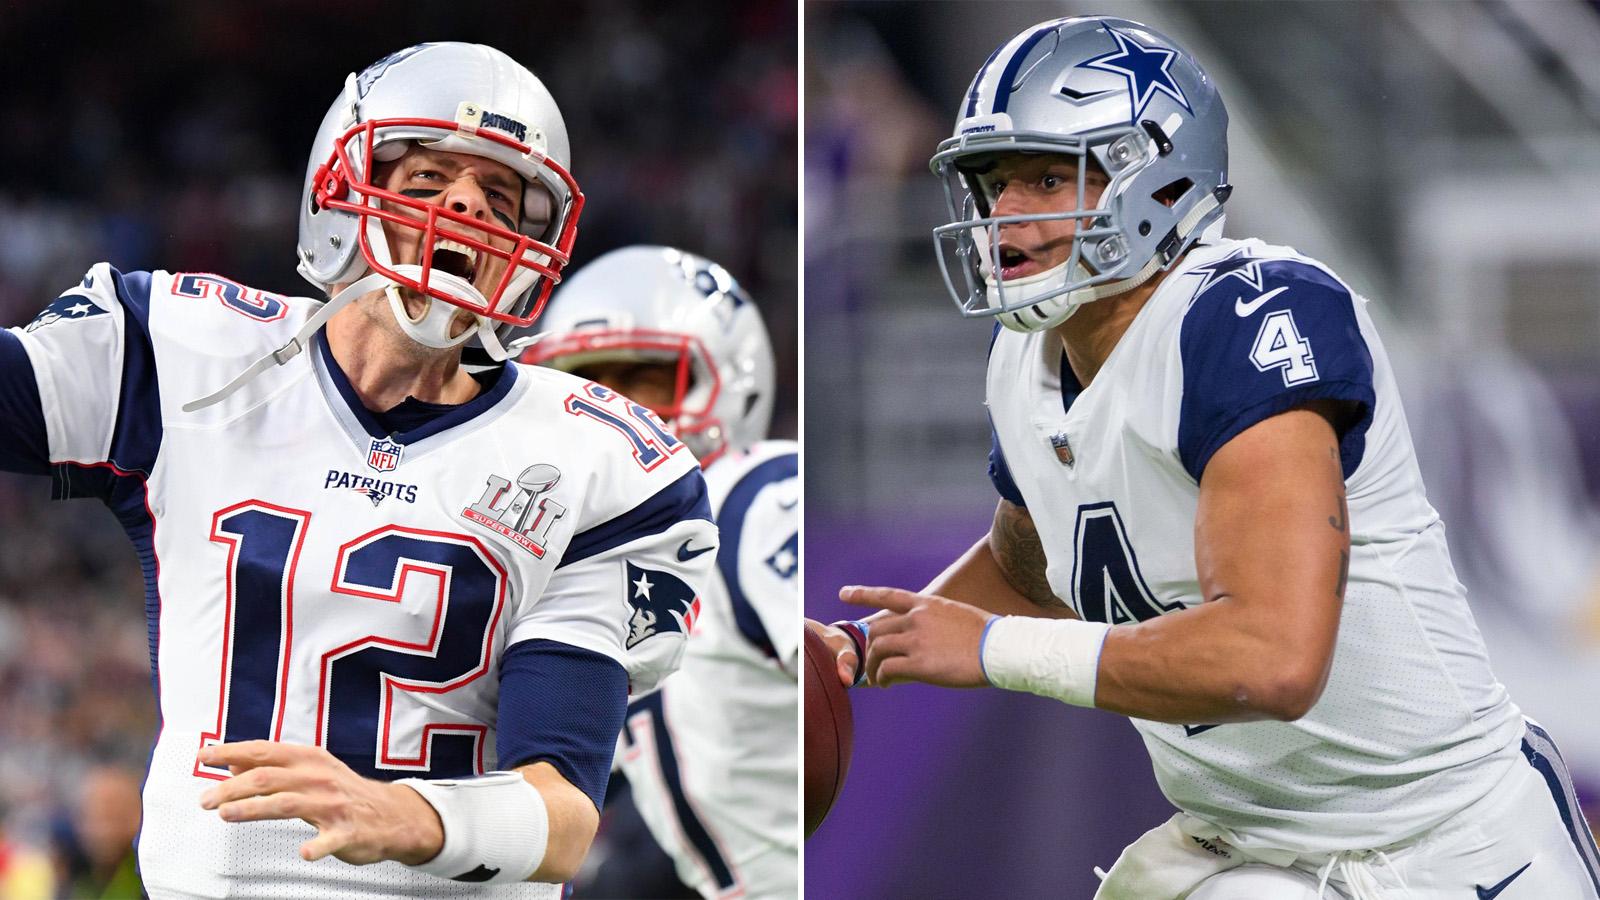 020617-NFL-Cowboys-Patriots-Tom-Brady-Dak-Prescott